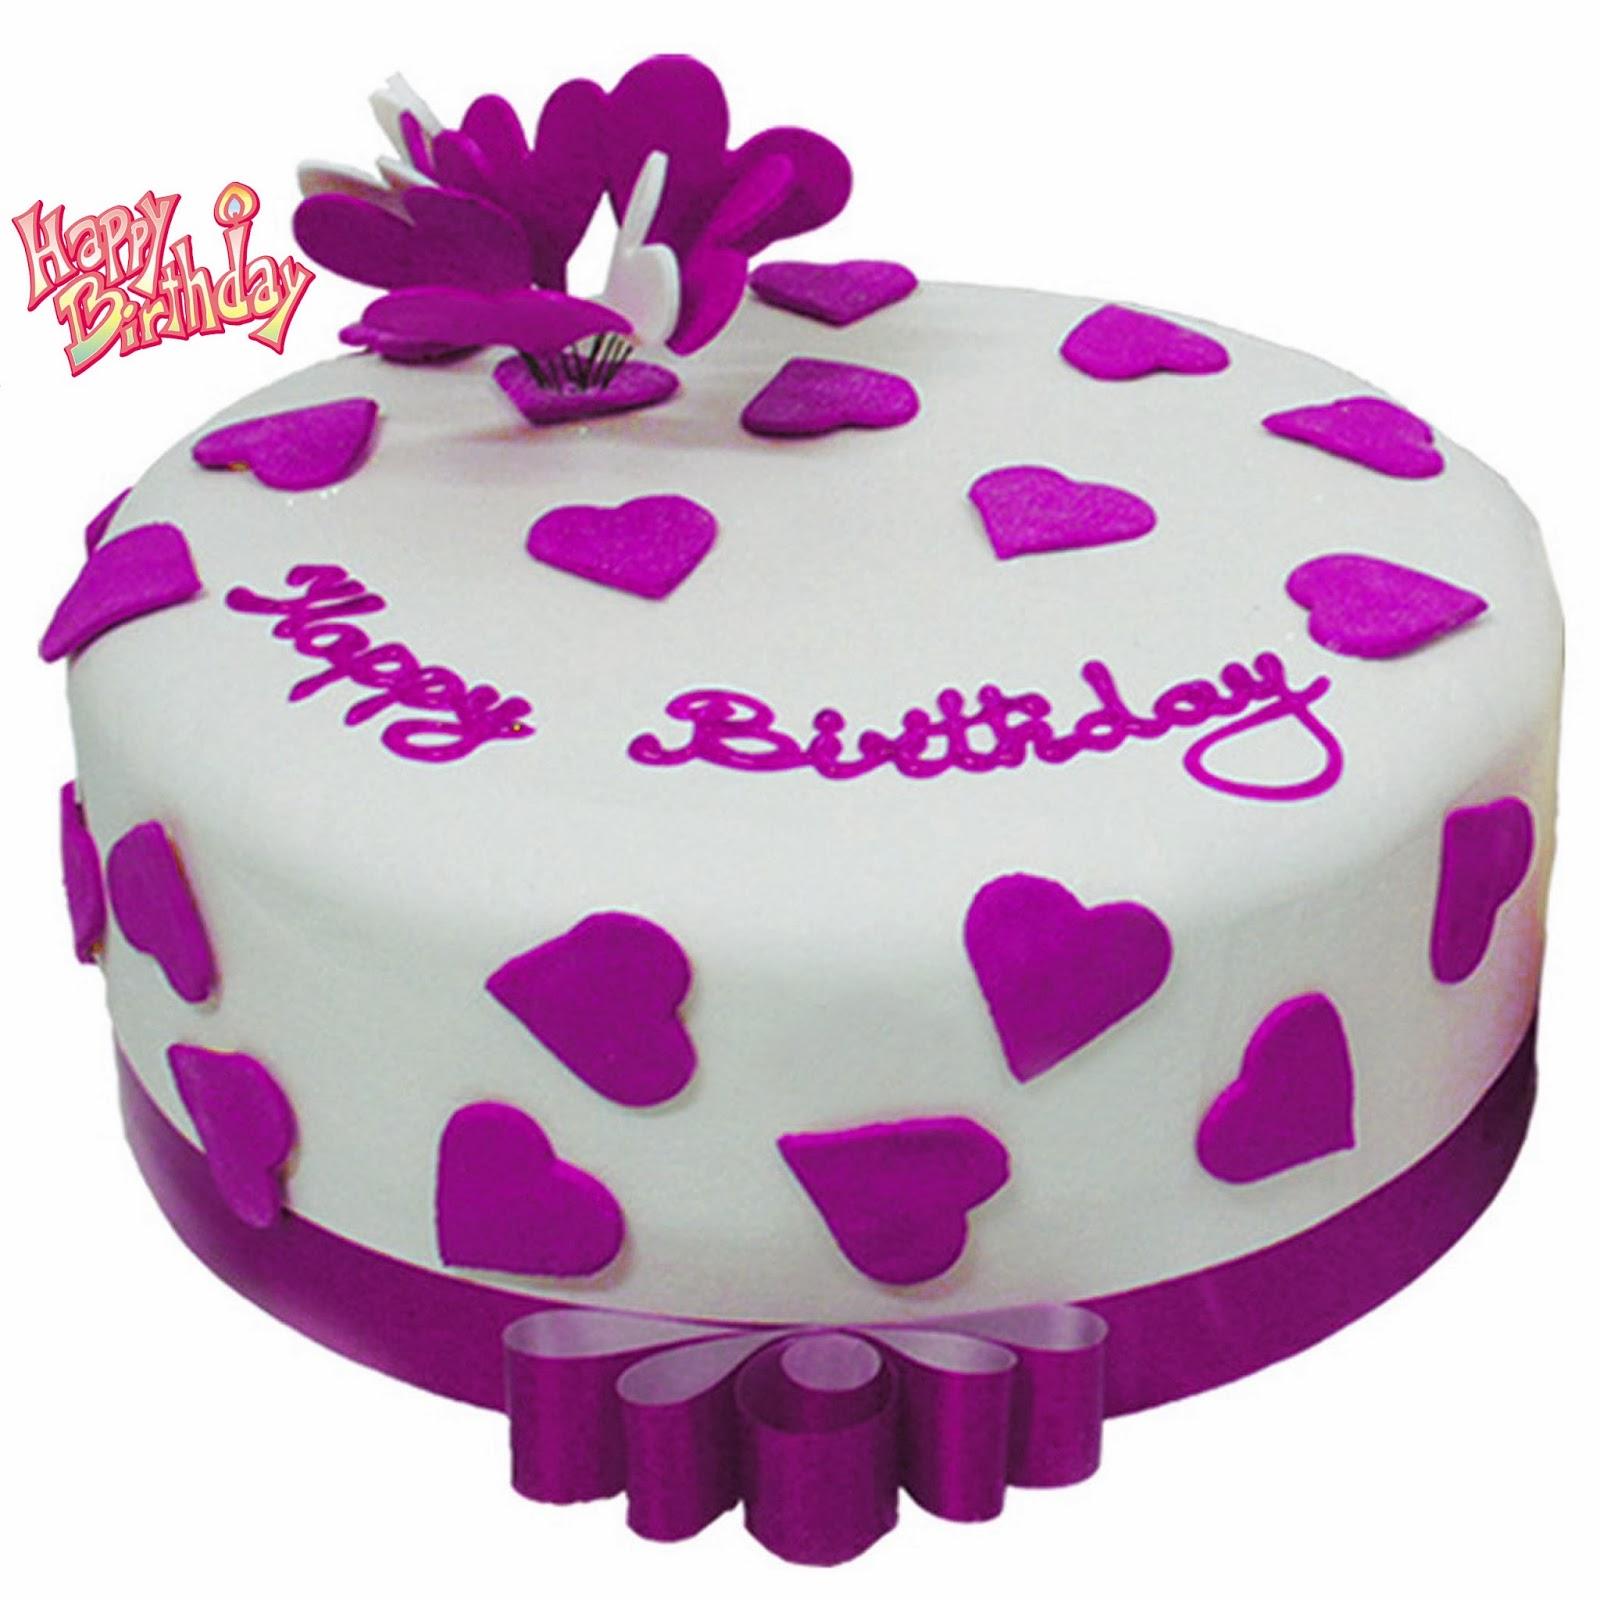 Happy-Birthday-Cream-Cake-Image-HD-Wide